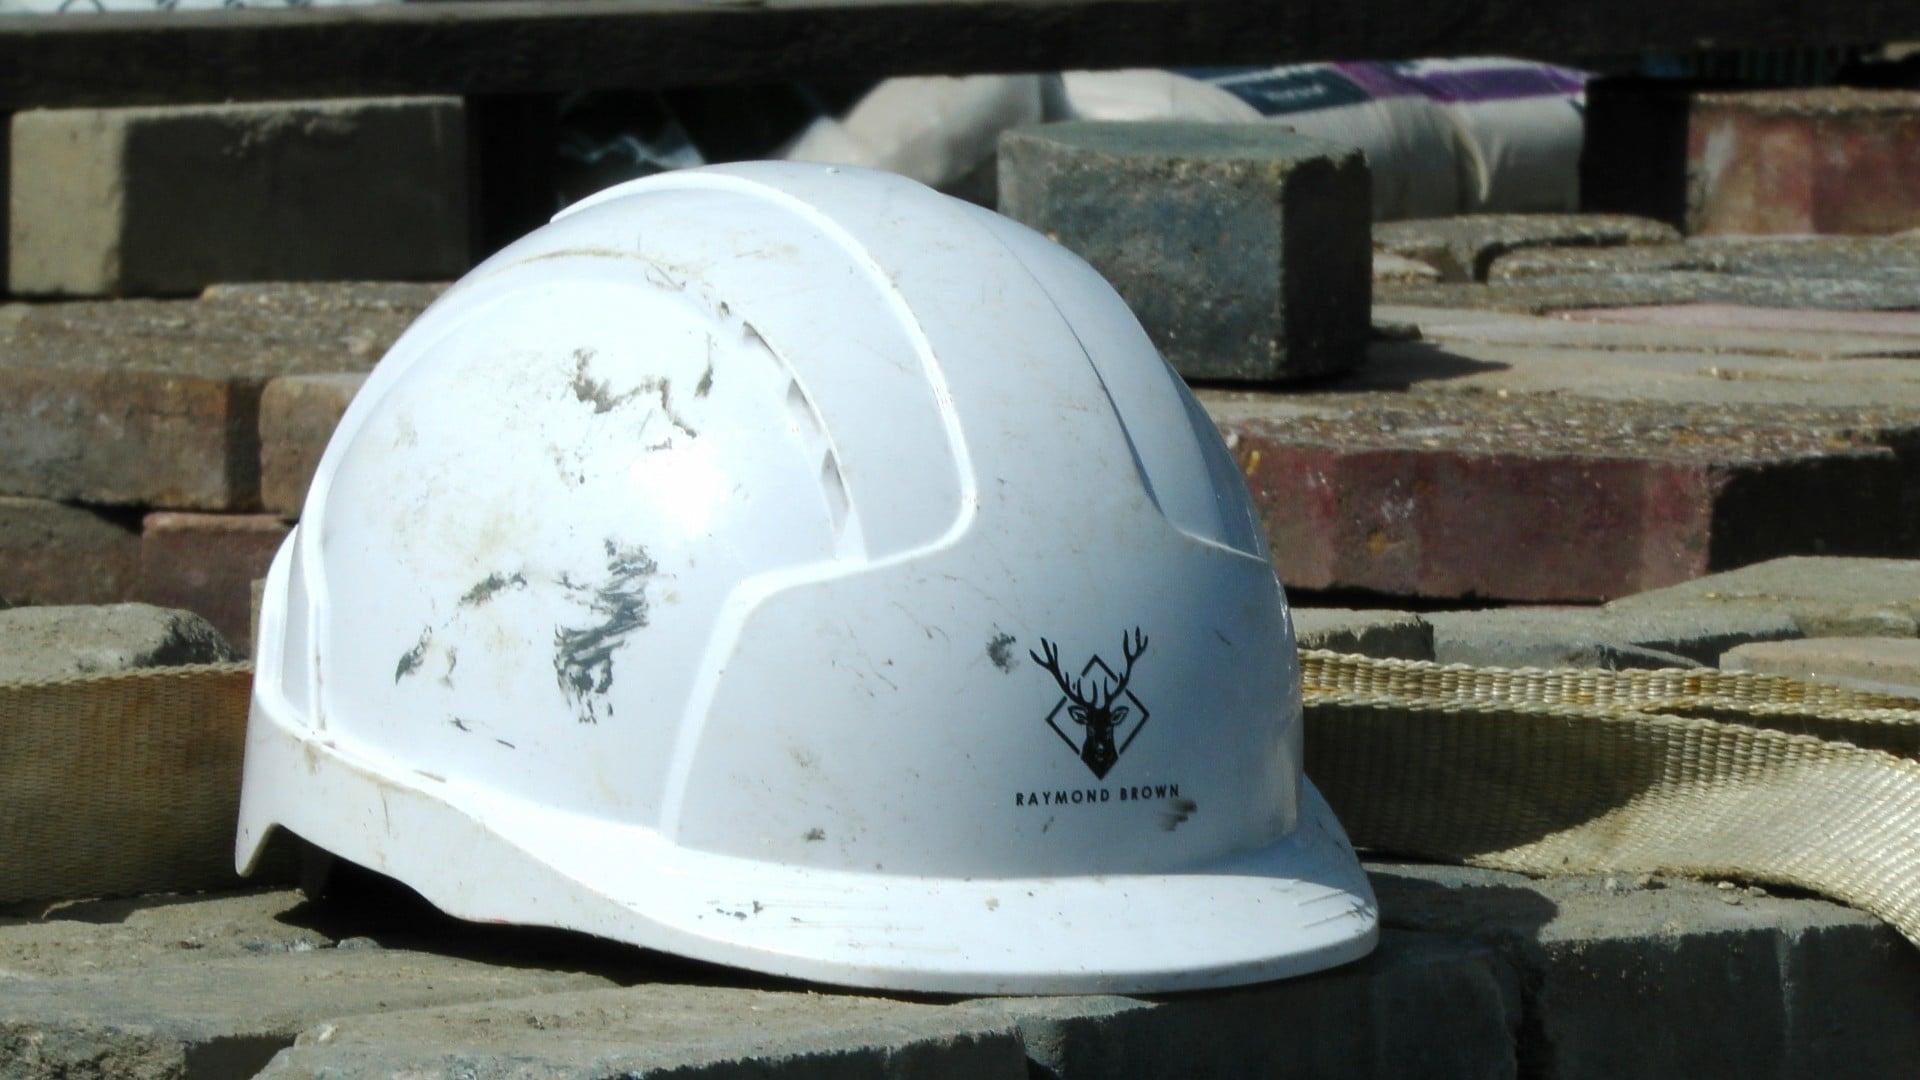 Workplace Injuries (WSIB) - Kitchener and Waterloo Region